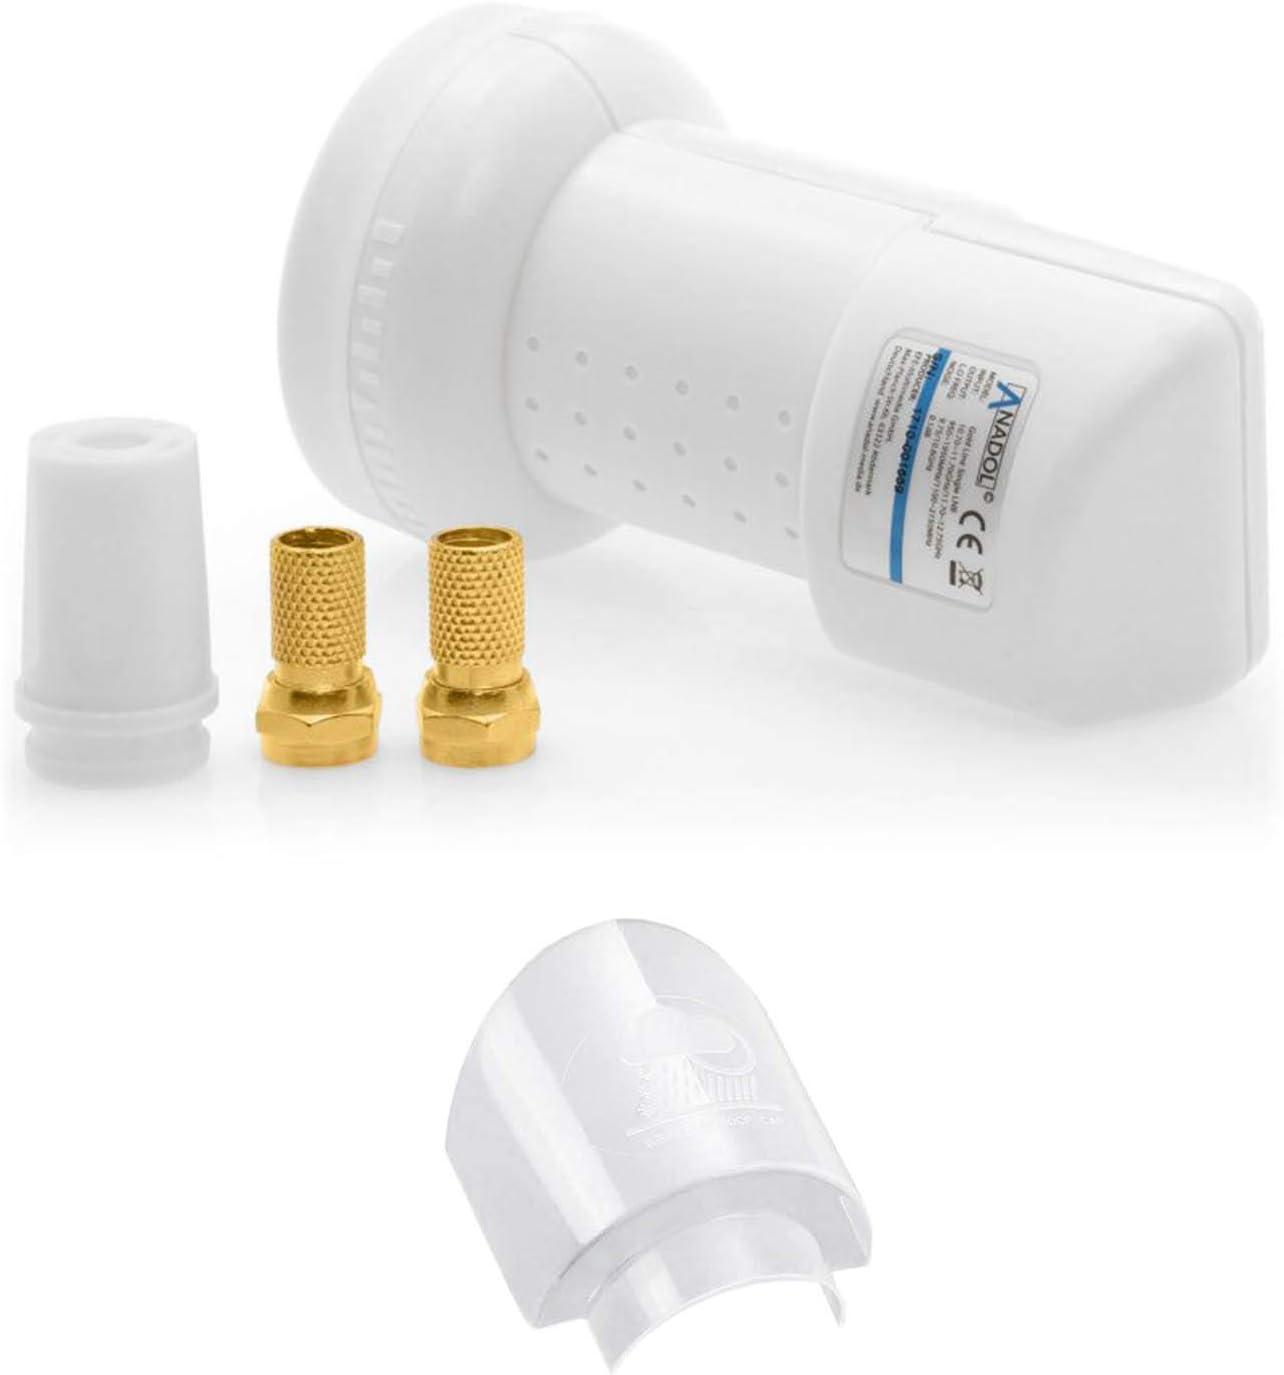 Anadol GoldLine Single LNB 0,1 dB [test 2X muy bueno] – extremadamente frío & resistente al calor (-30 hasta 60 °C)